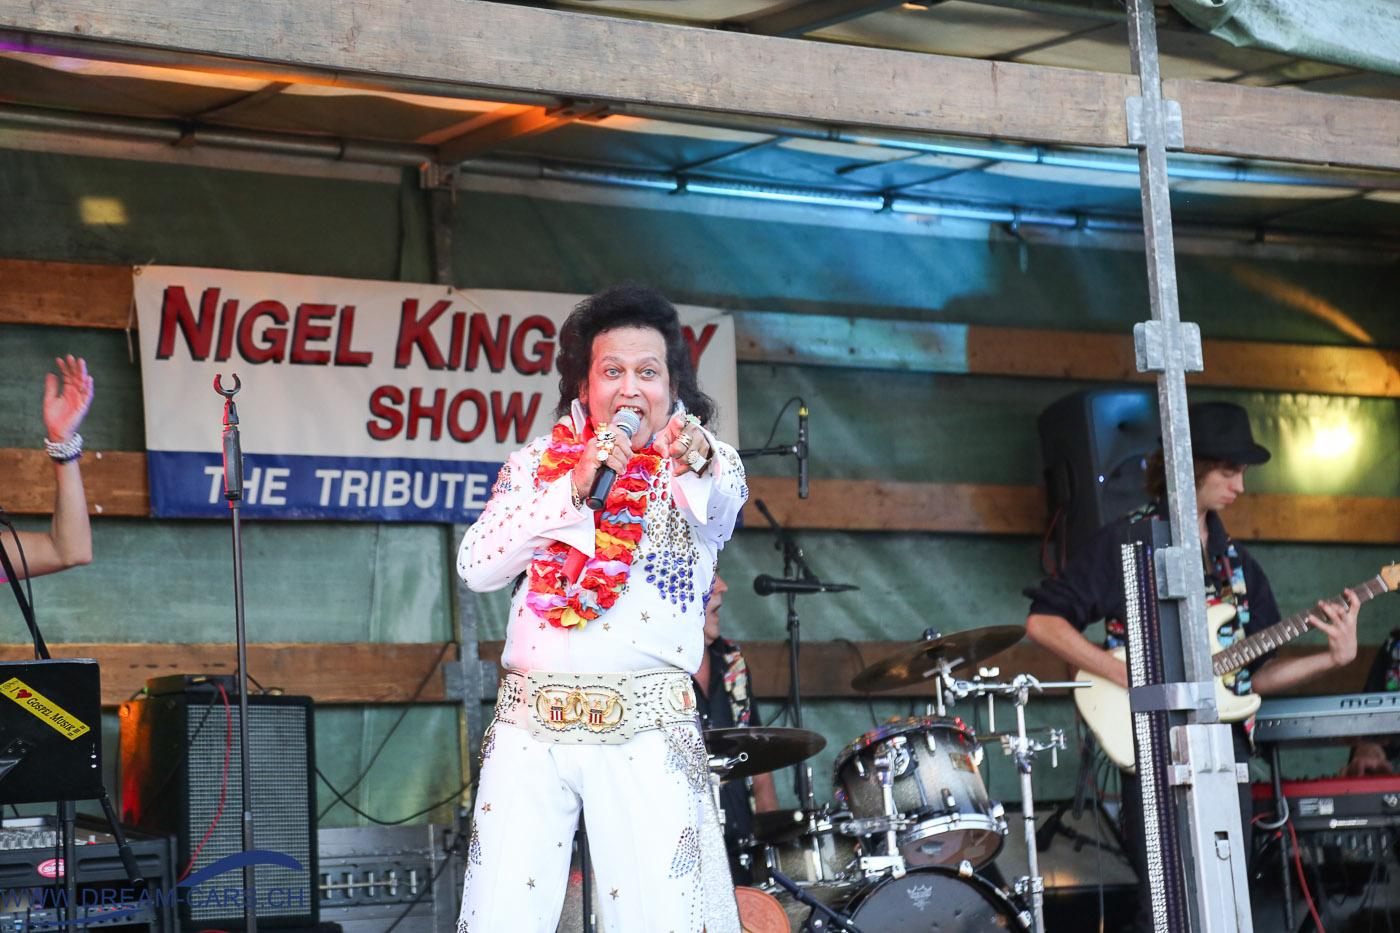 Autokino Muri, 23. Juli 2016. Unterhaltung mit Nigel Kinglsey